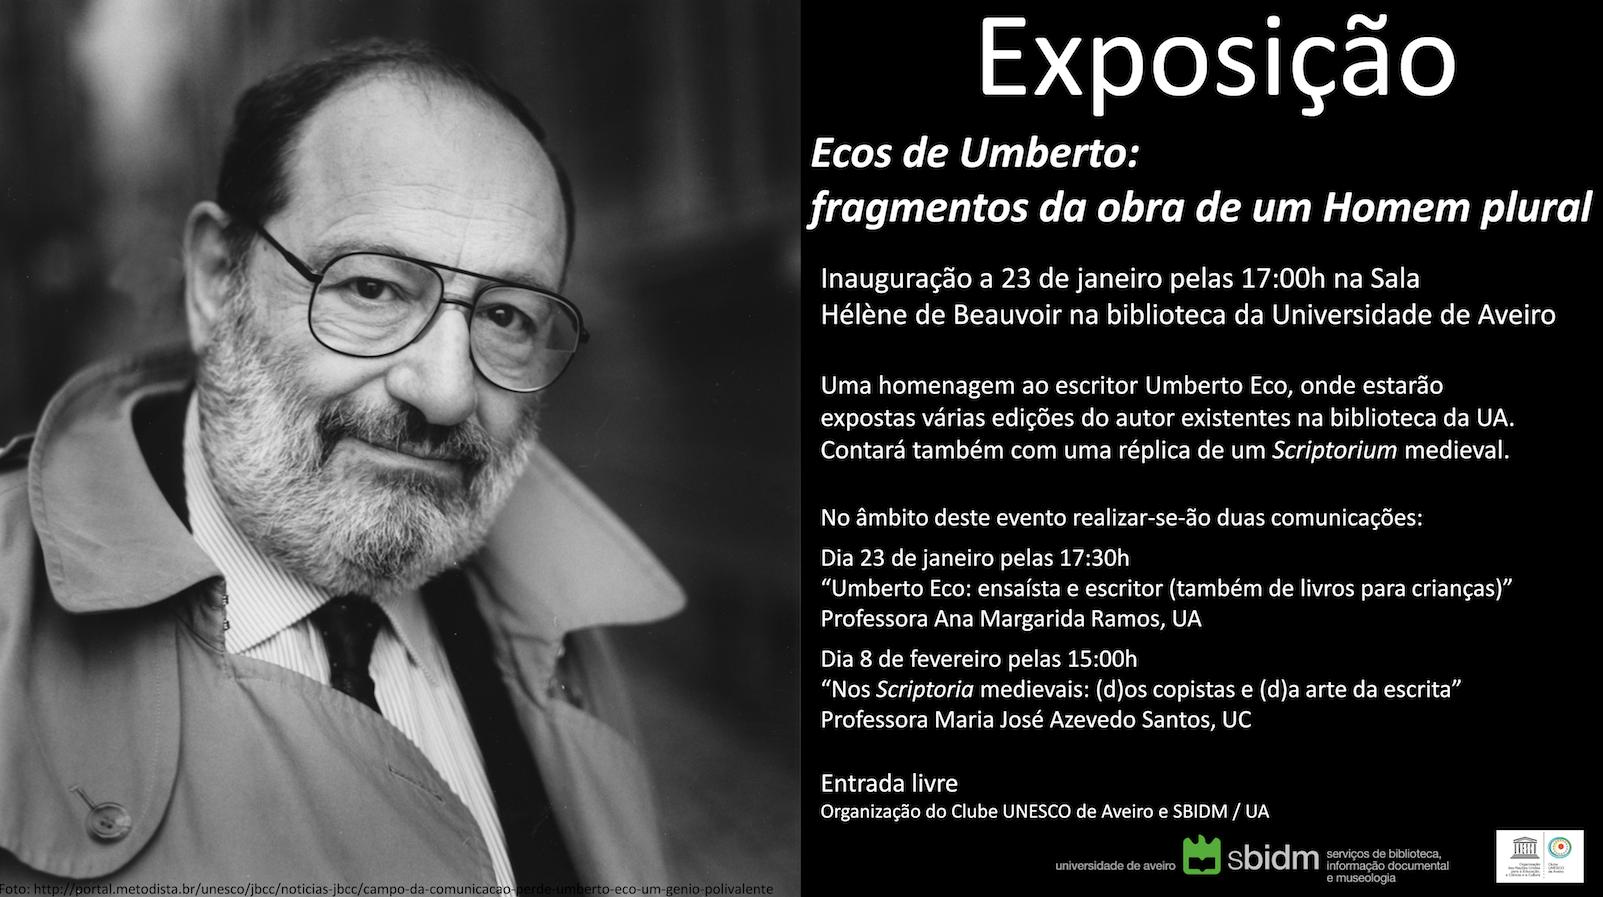 Ecos de Humberto